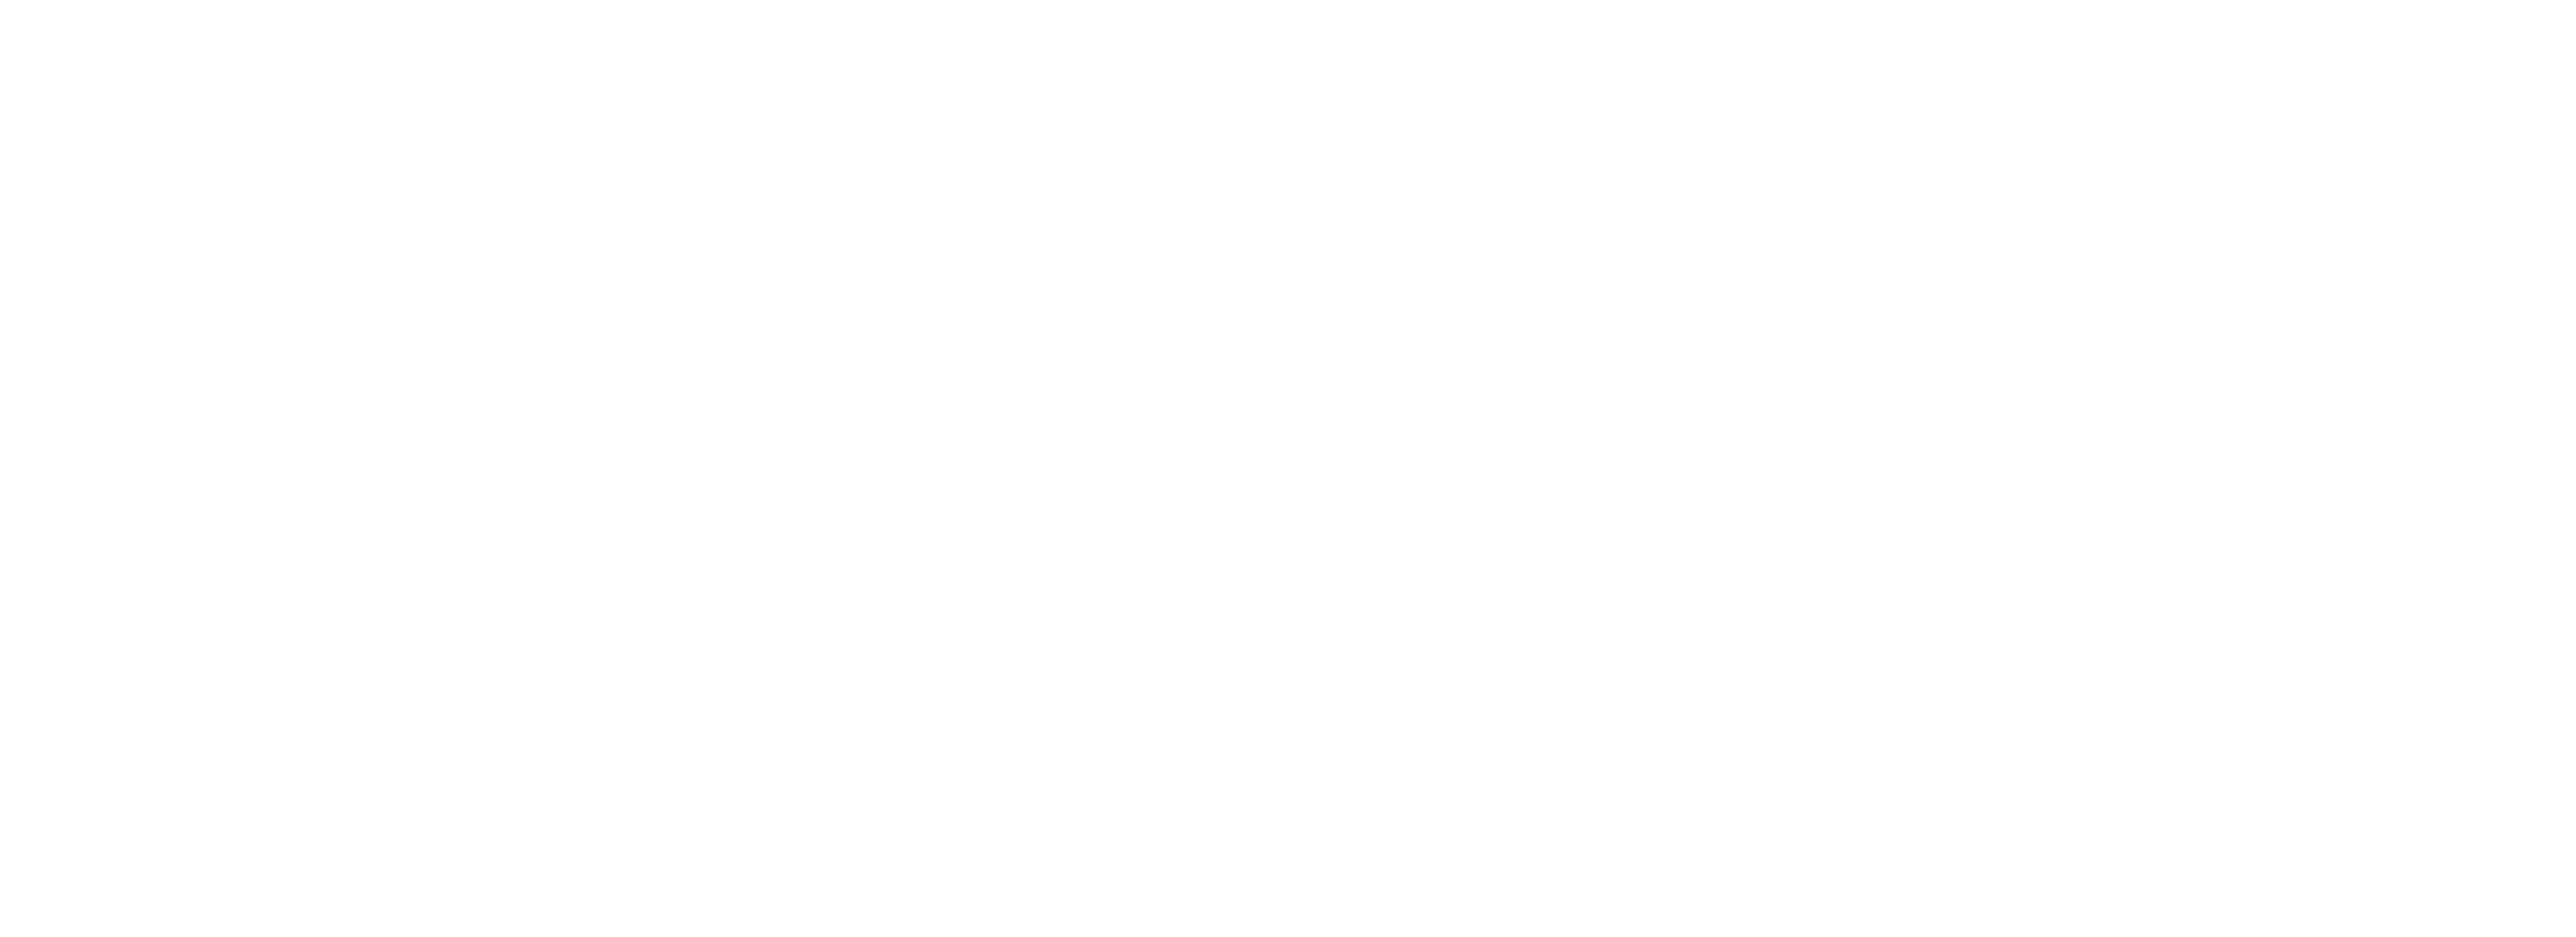 Saunders10k.com